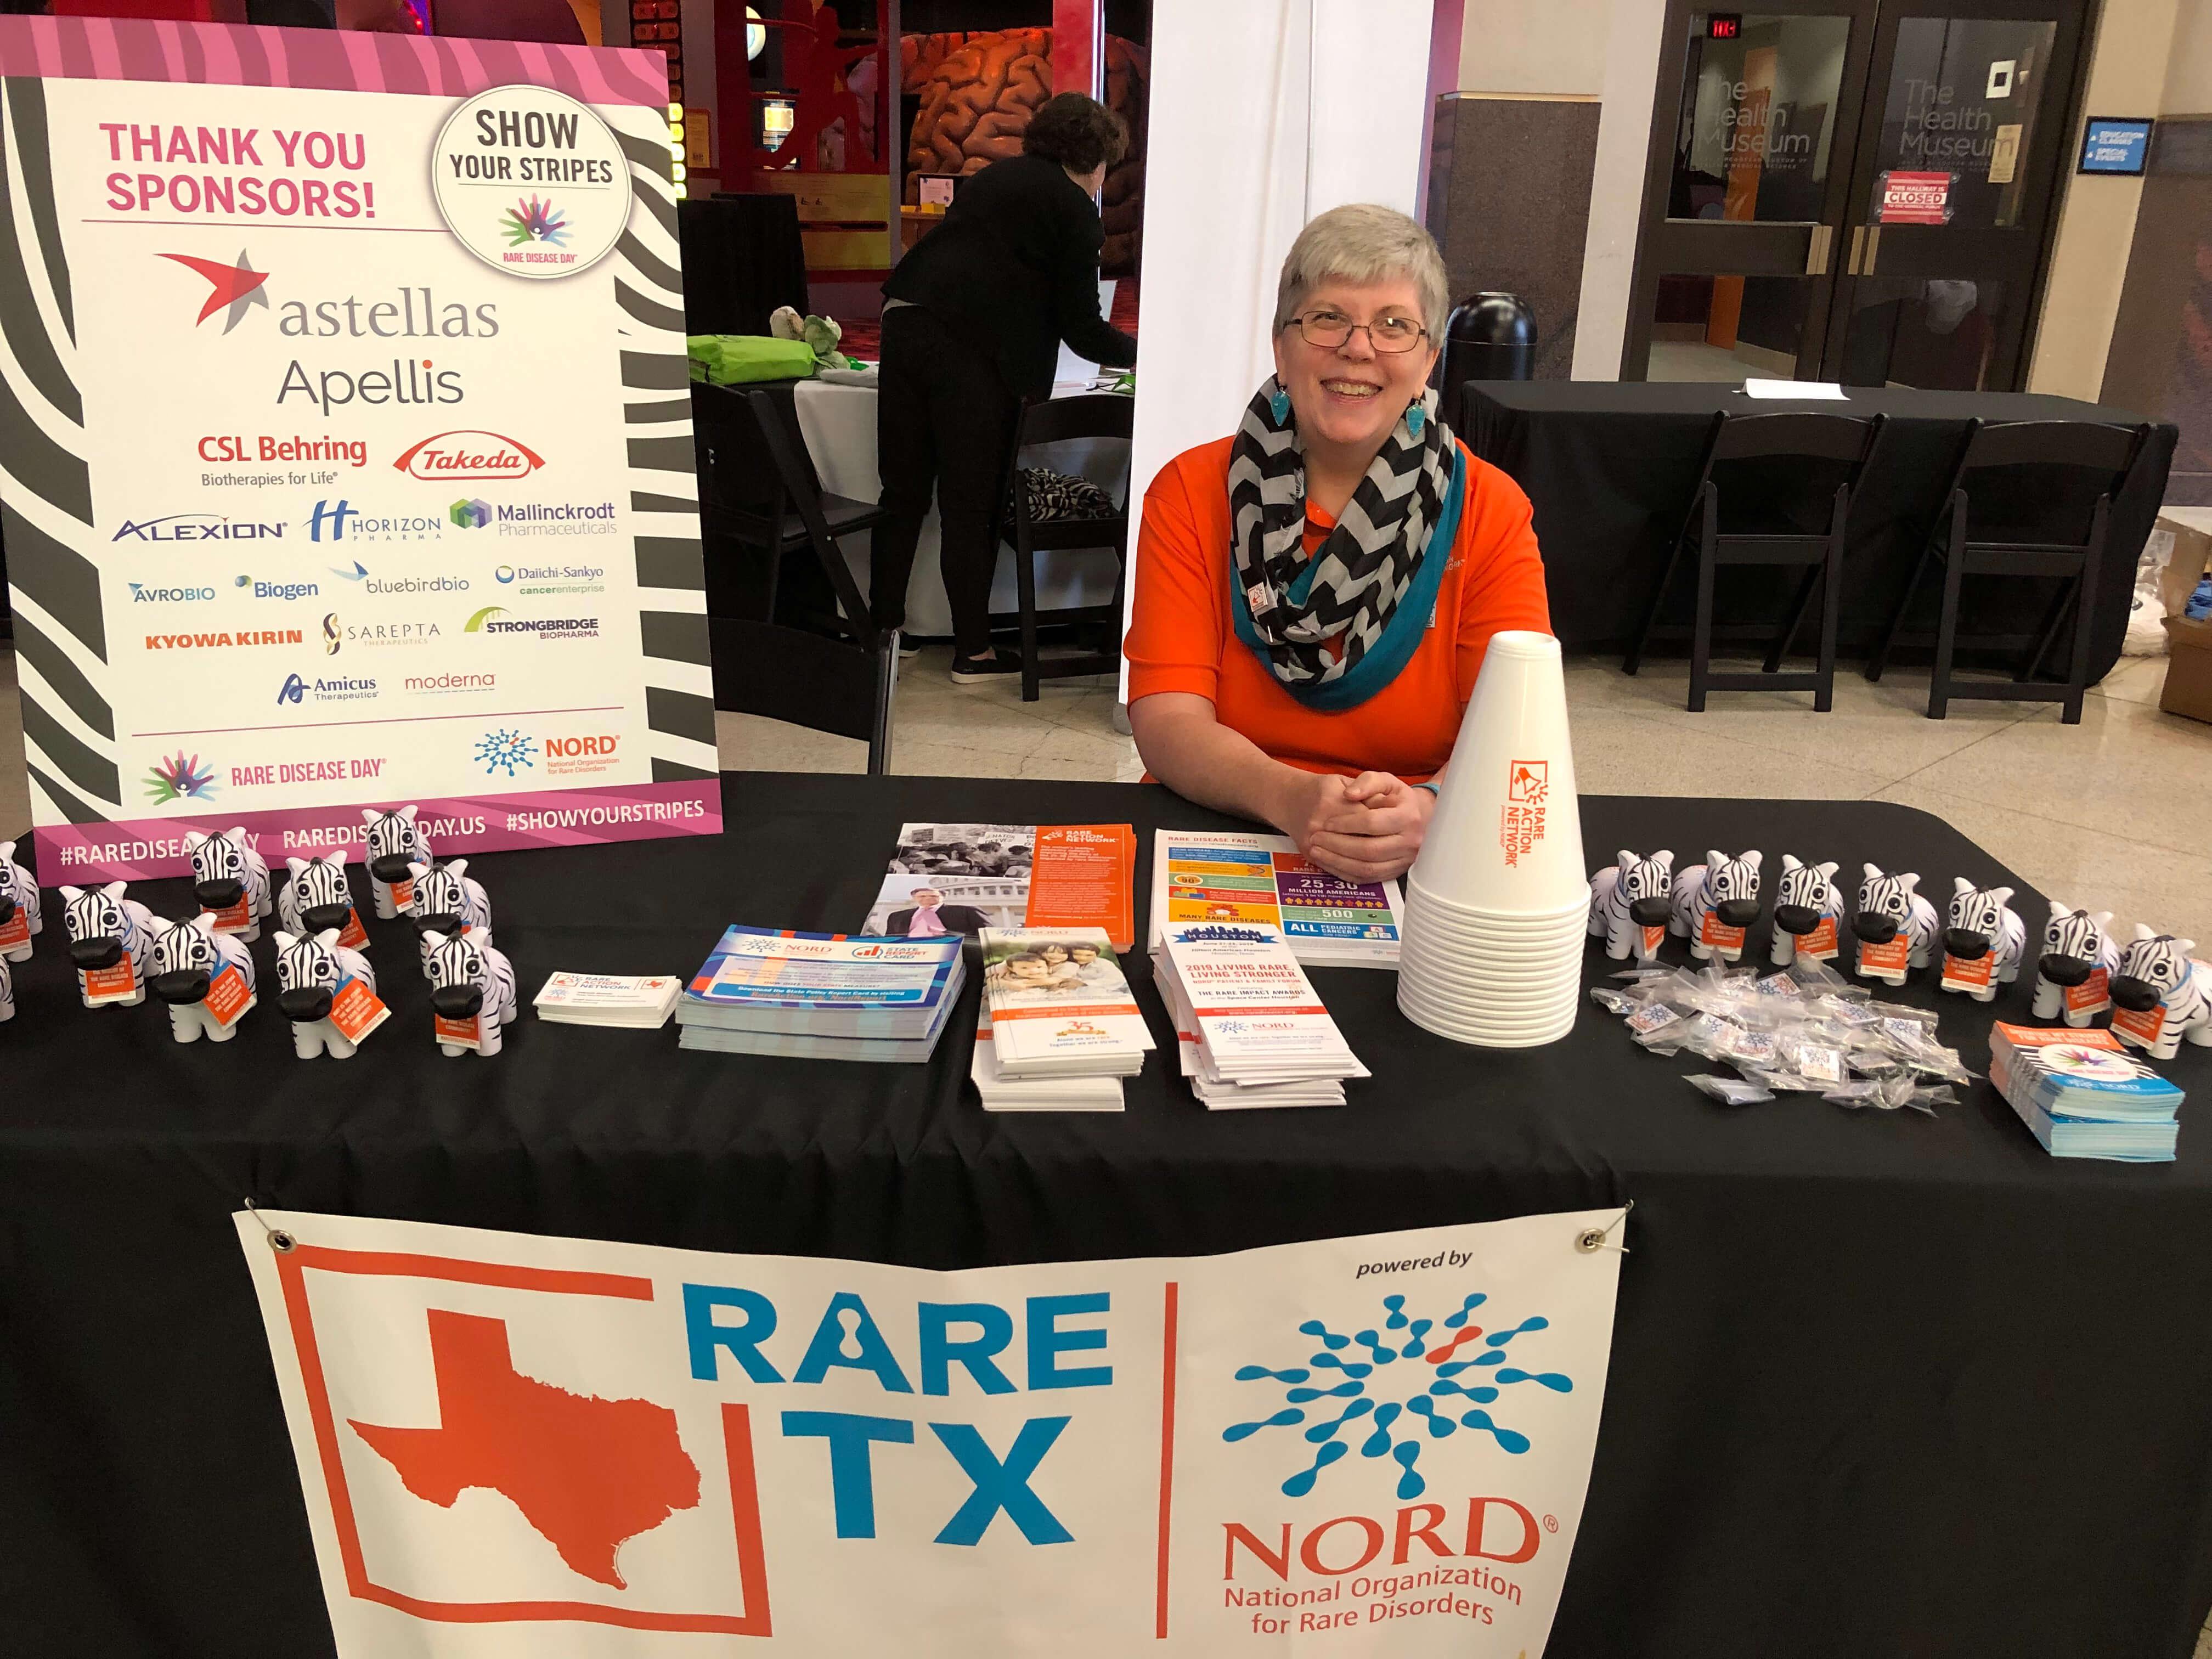 Deborah Skolaski raising awareness at The Health Museum during Rare Disease Day in February. (Photo courtesy of Deborah Skolaski)